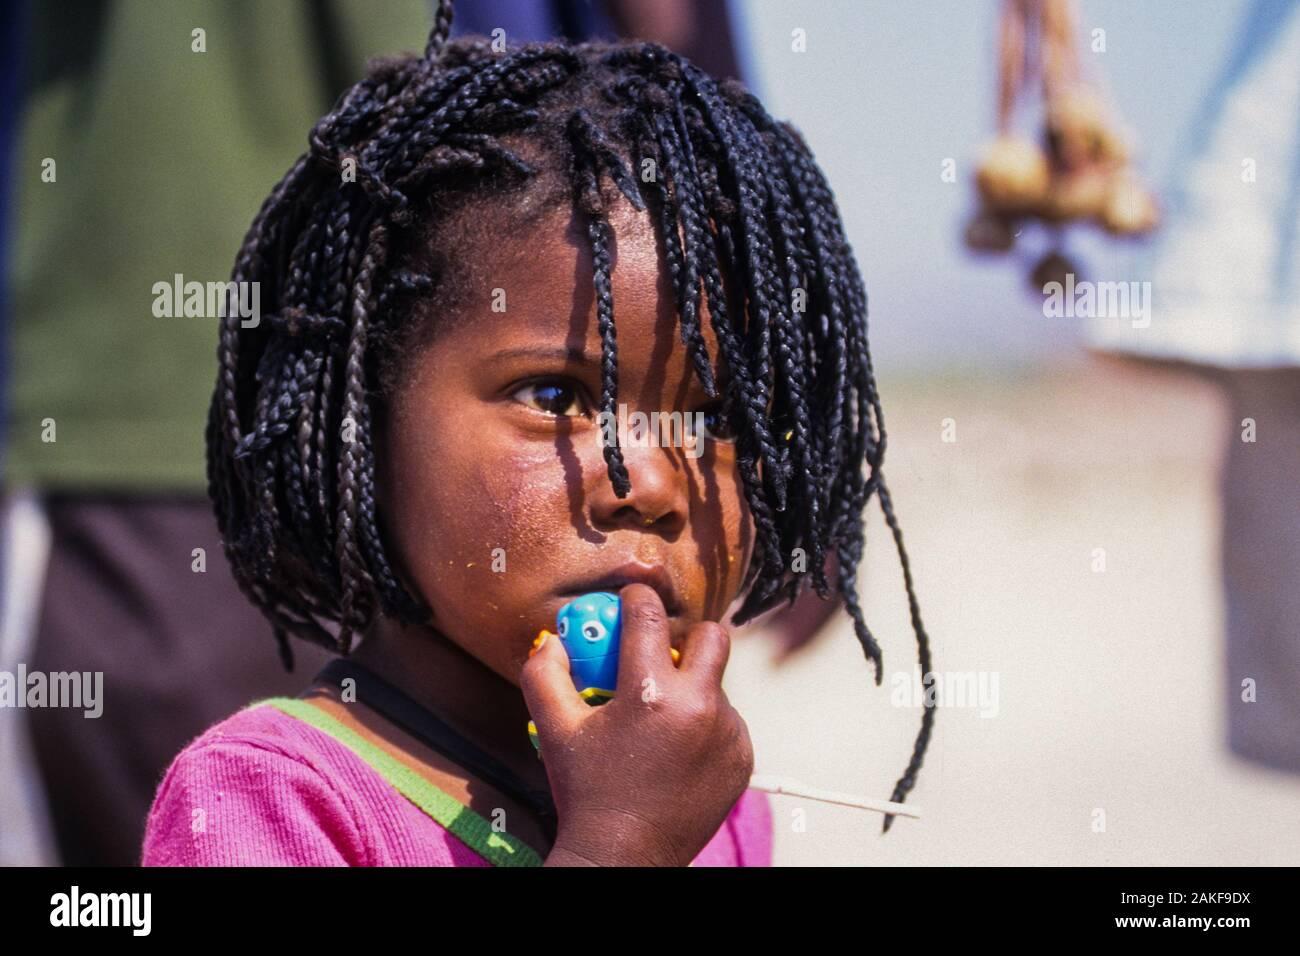 Himba female child in a Himba village, Kaokoveld, Namibia, Africa Stock Photo